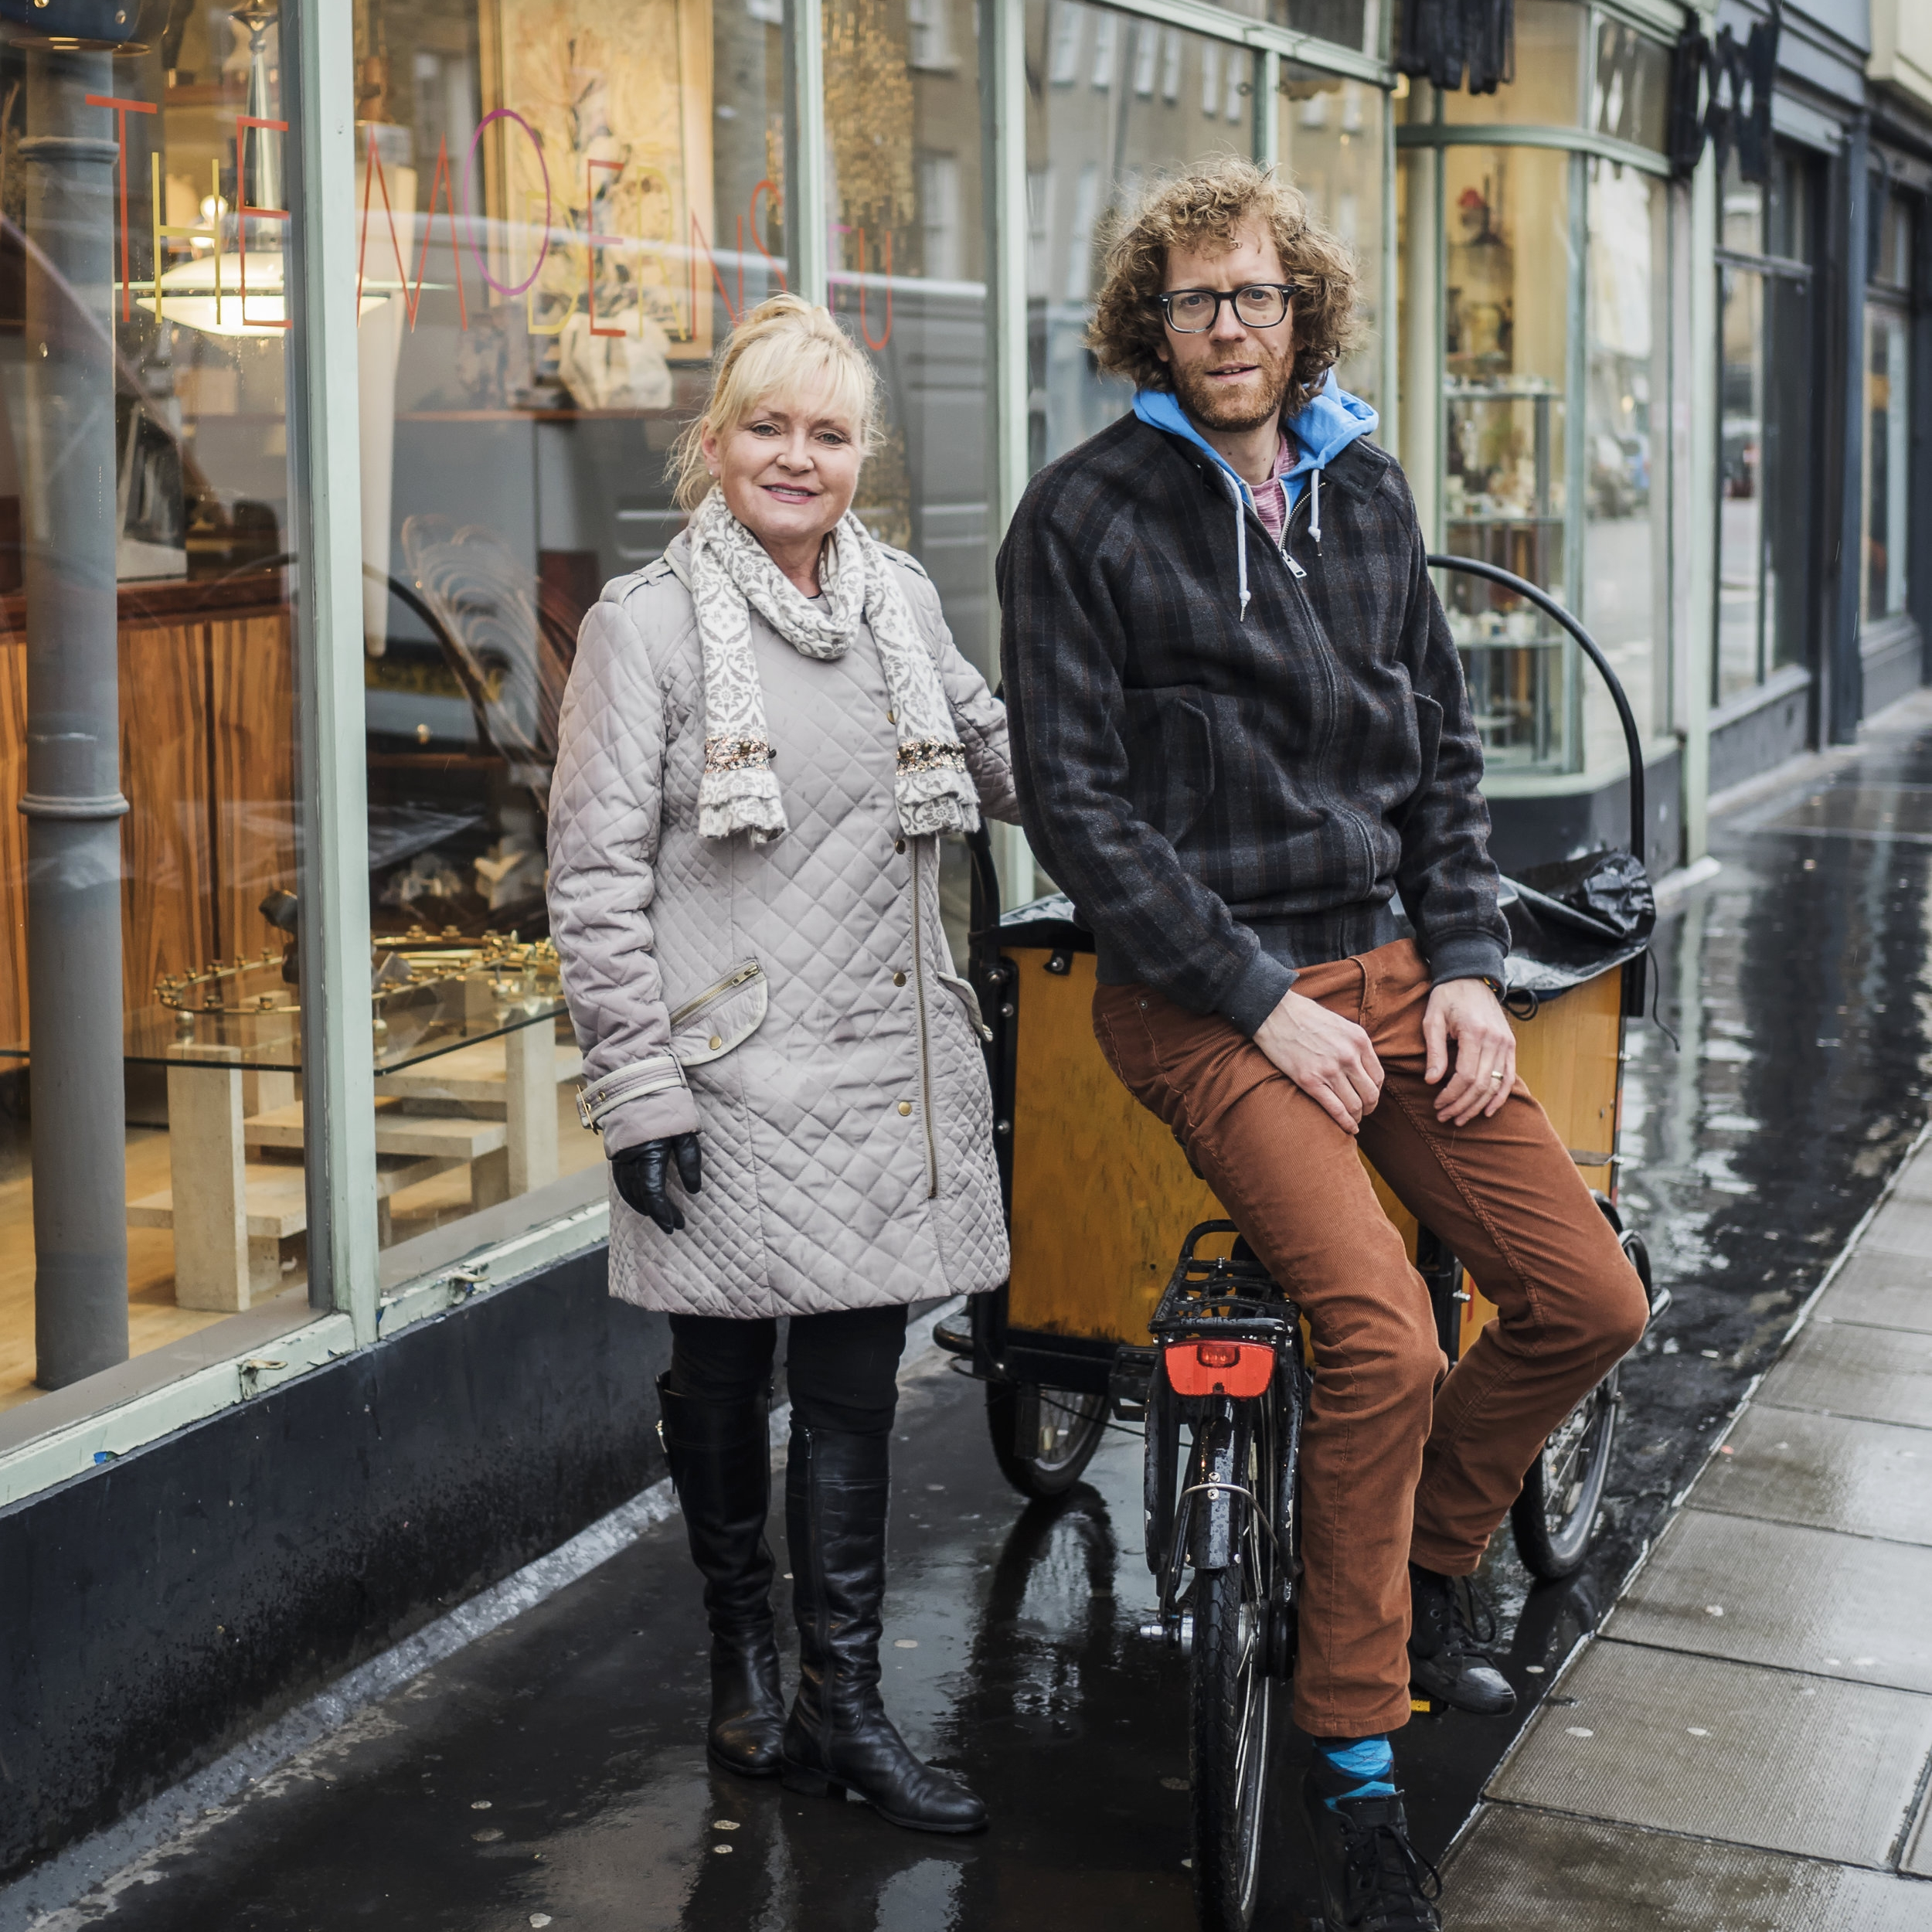 Caroline Cotton and Nathan Eddy of FoodCycle Marylebone